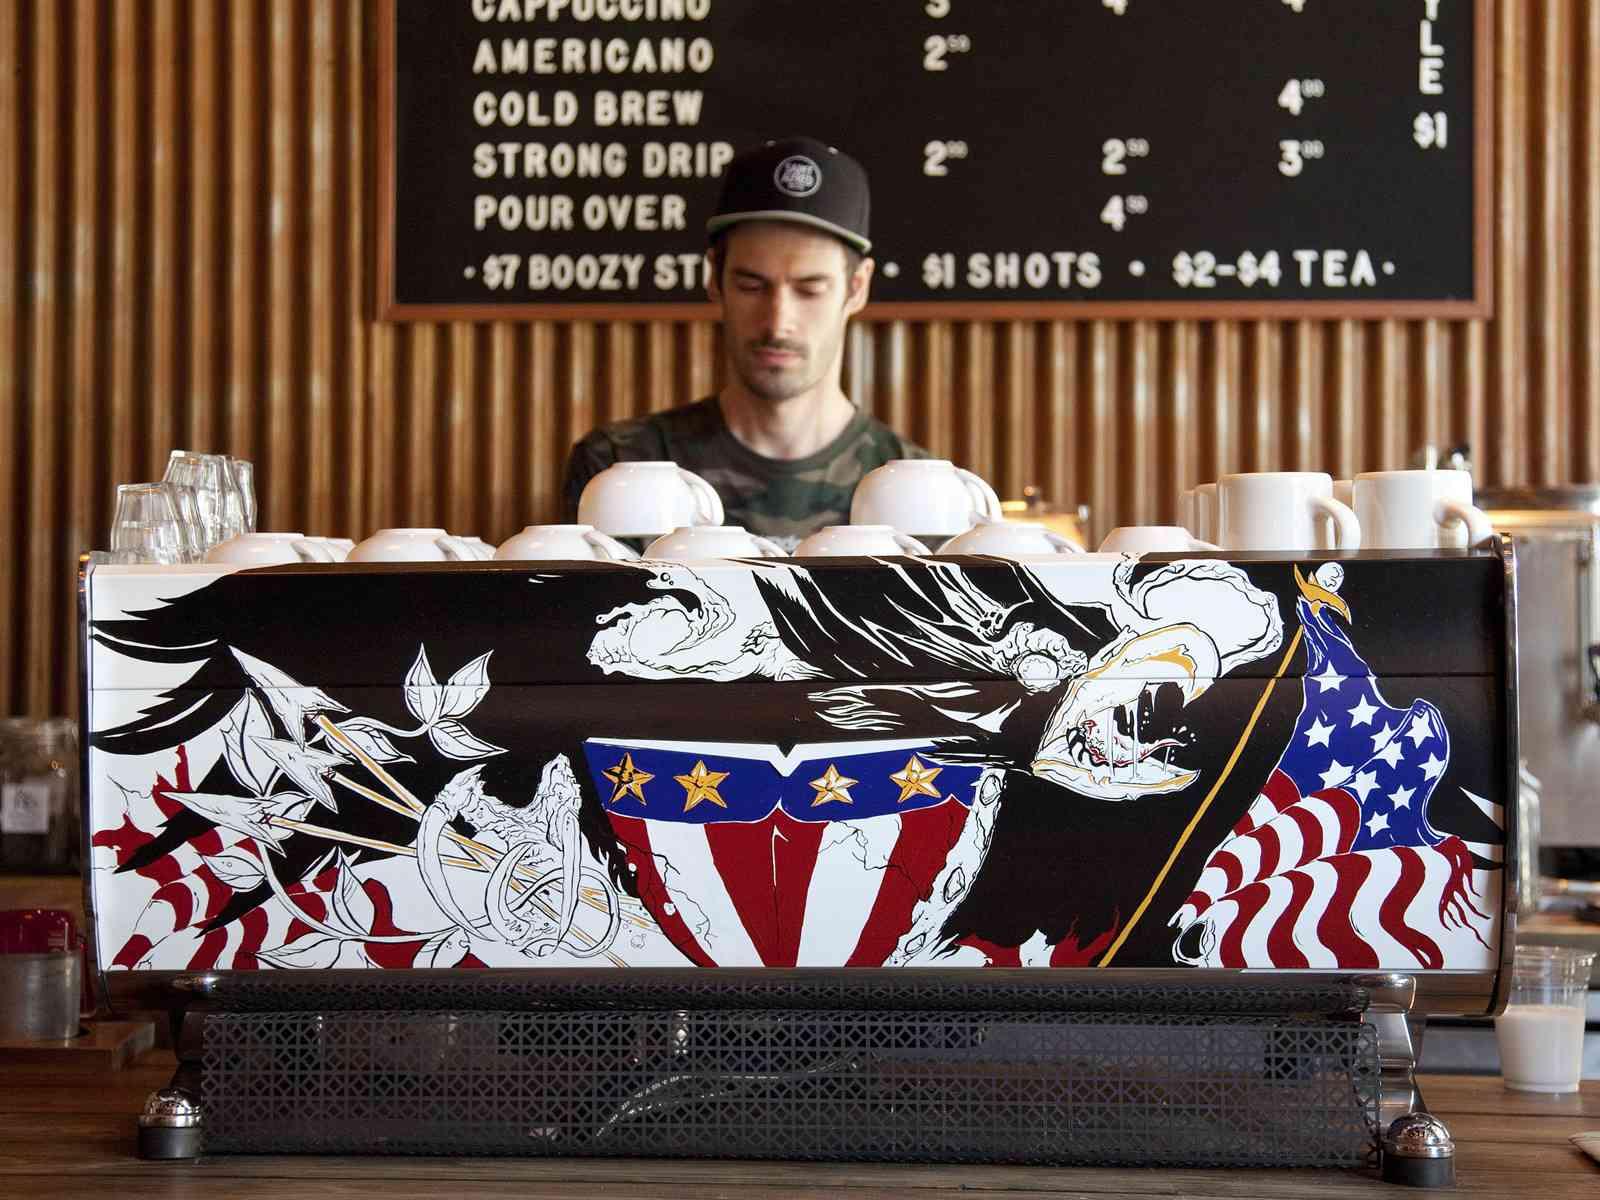 Decorate espresso machine with a male barista behind it